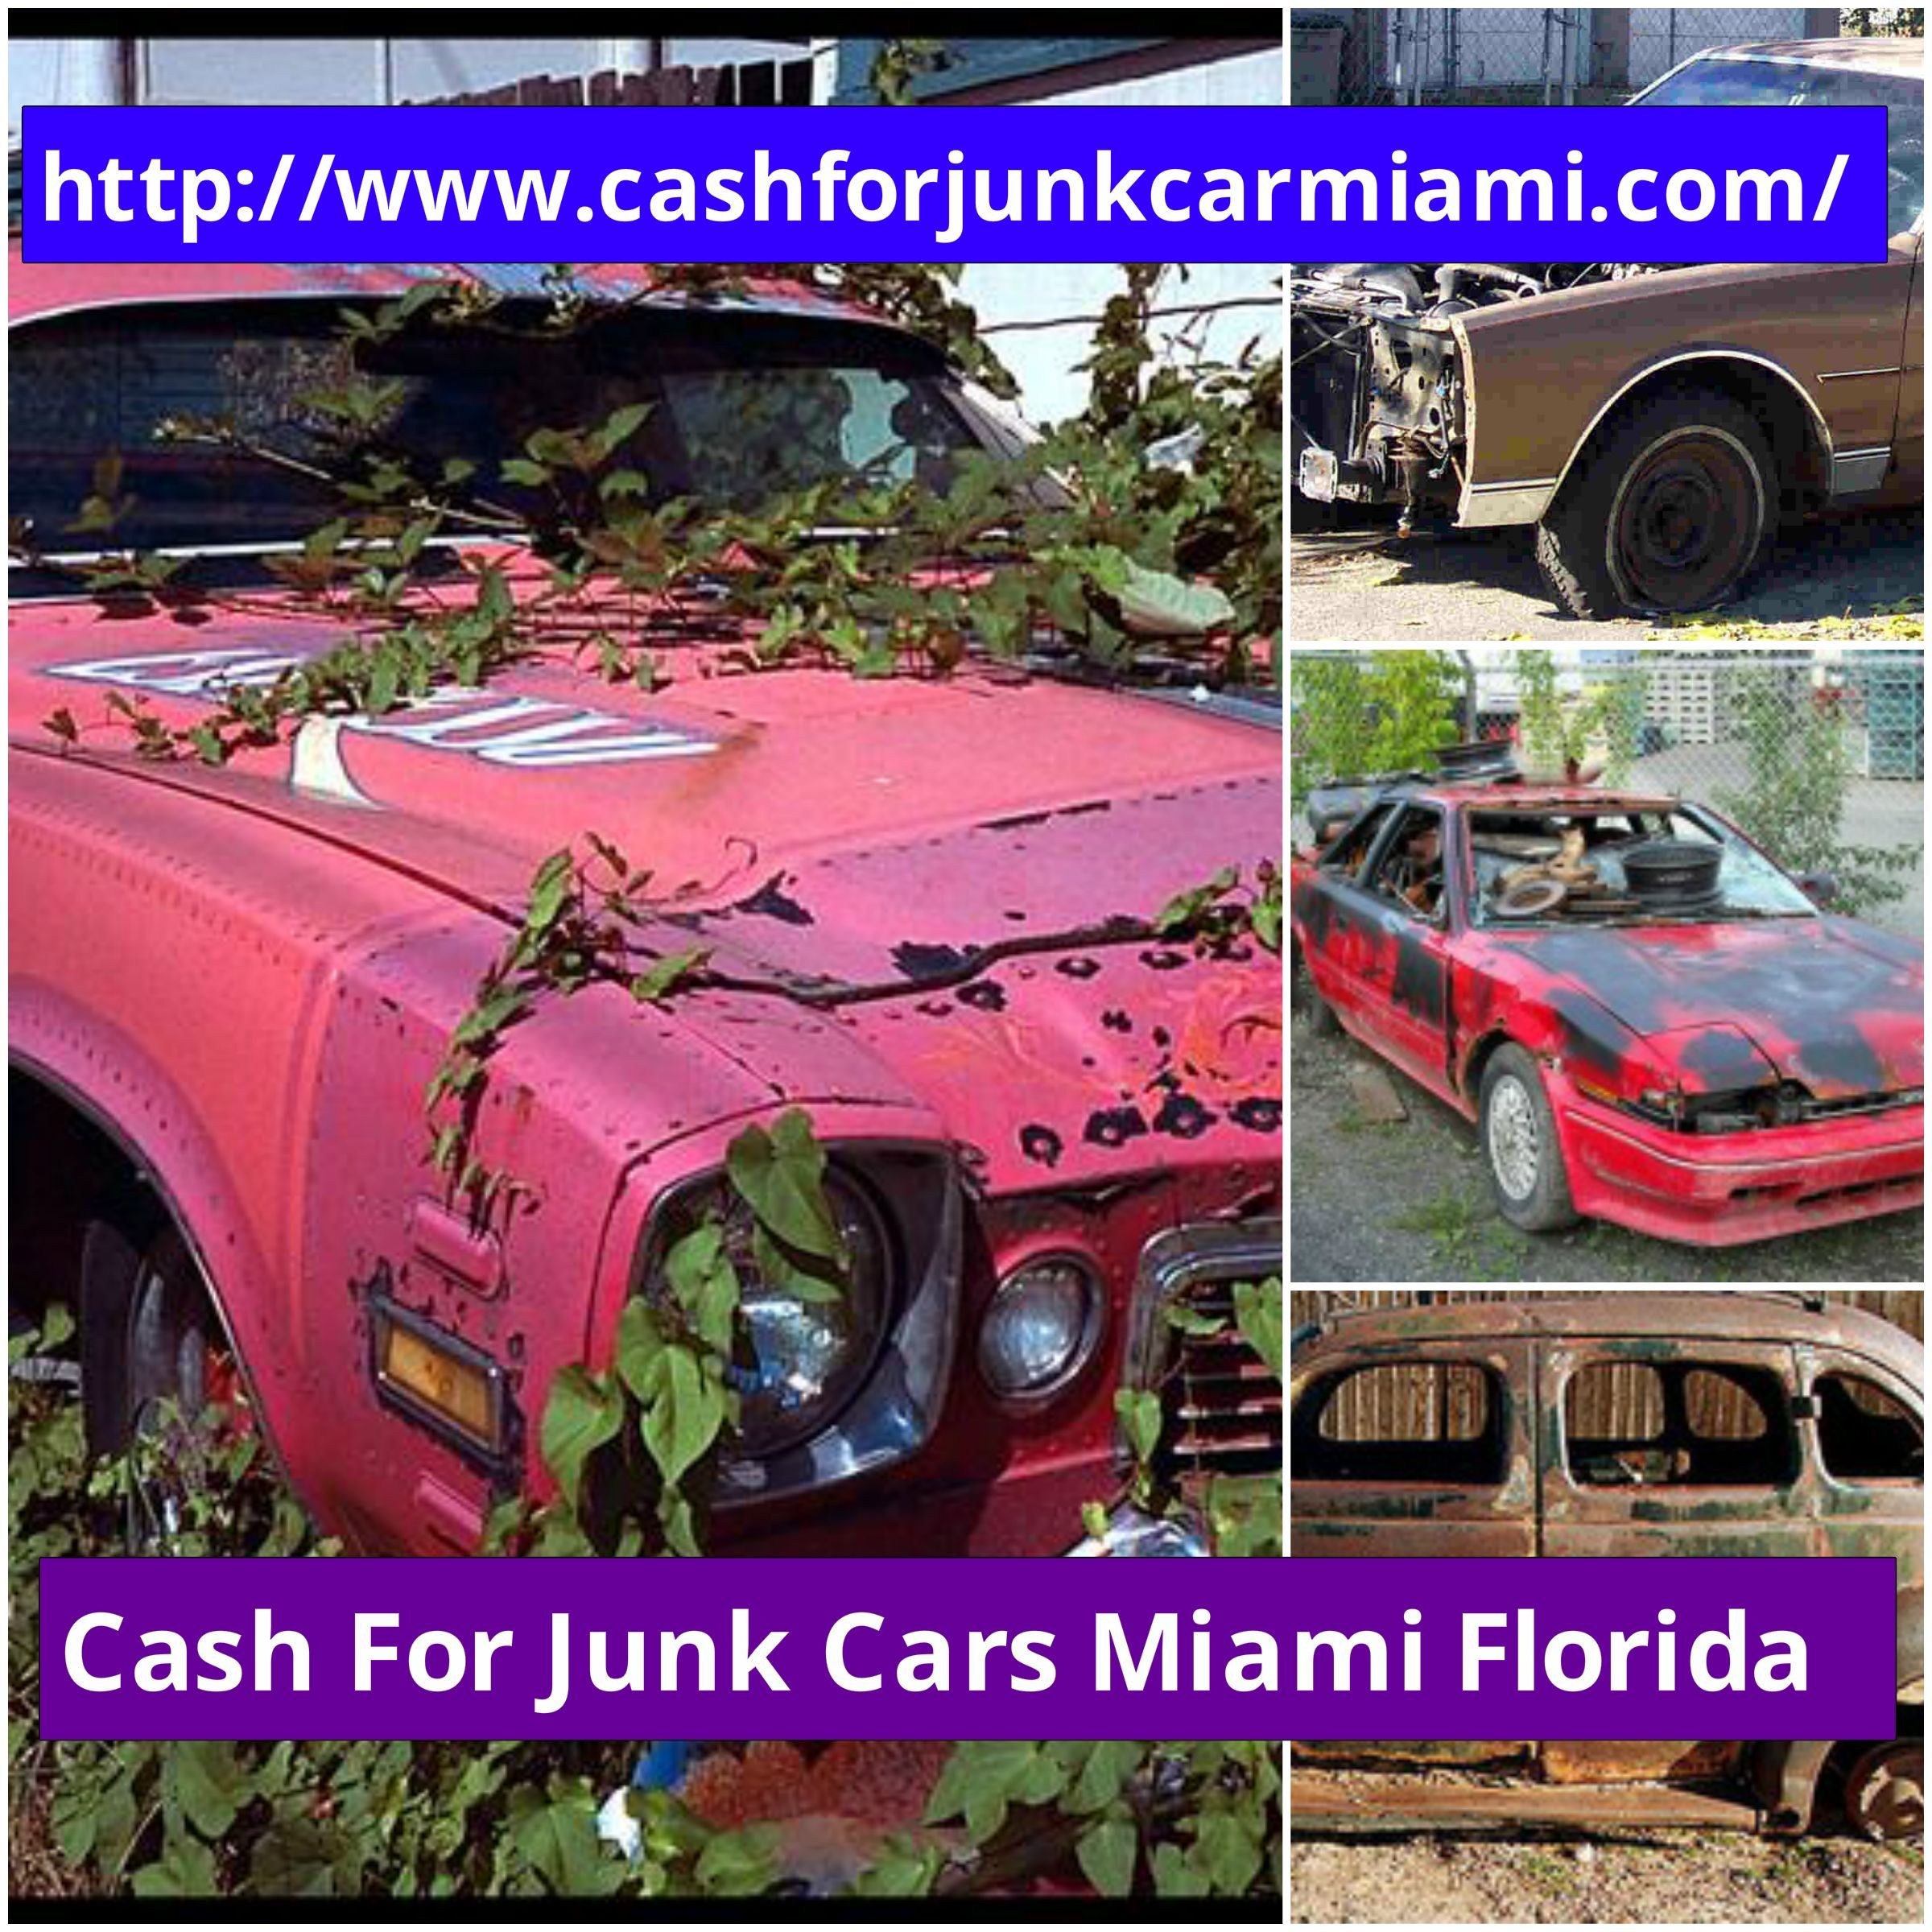 http://www.cashforjunkcarmiami.com/ Cash for junk cars Miami ...